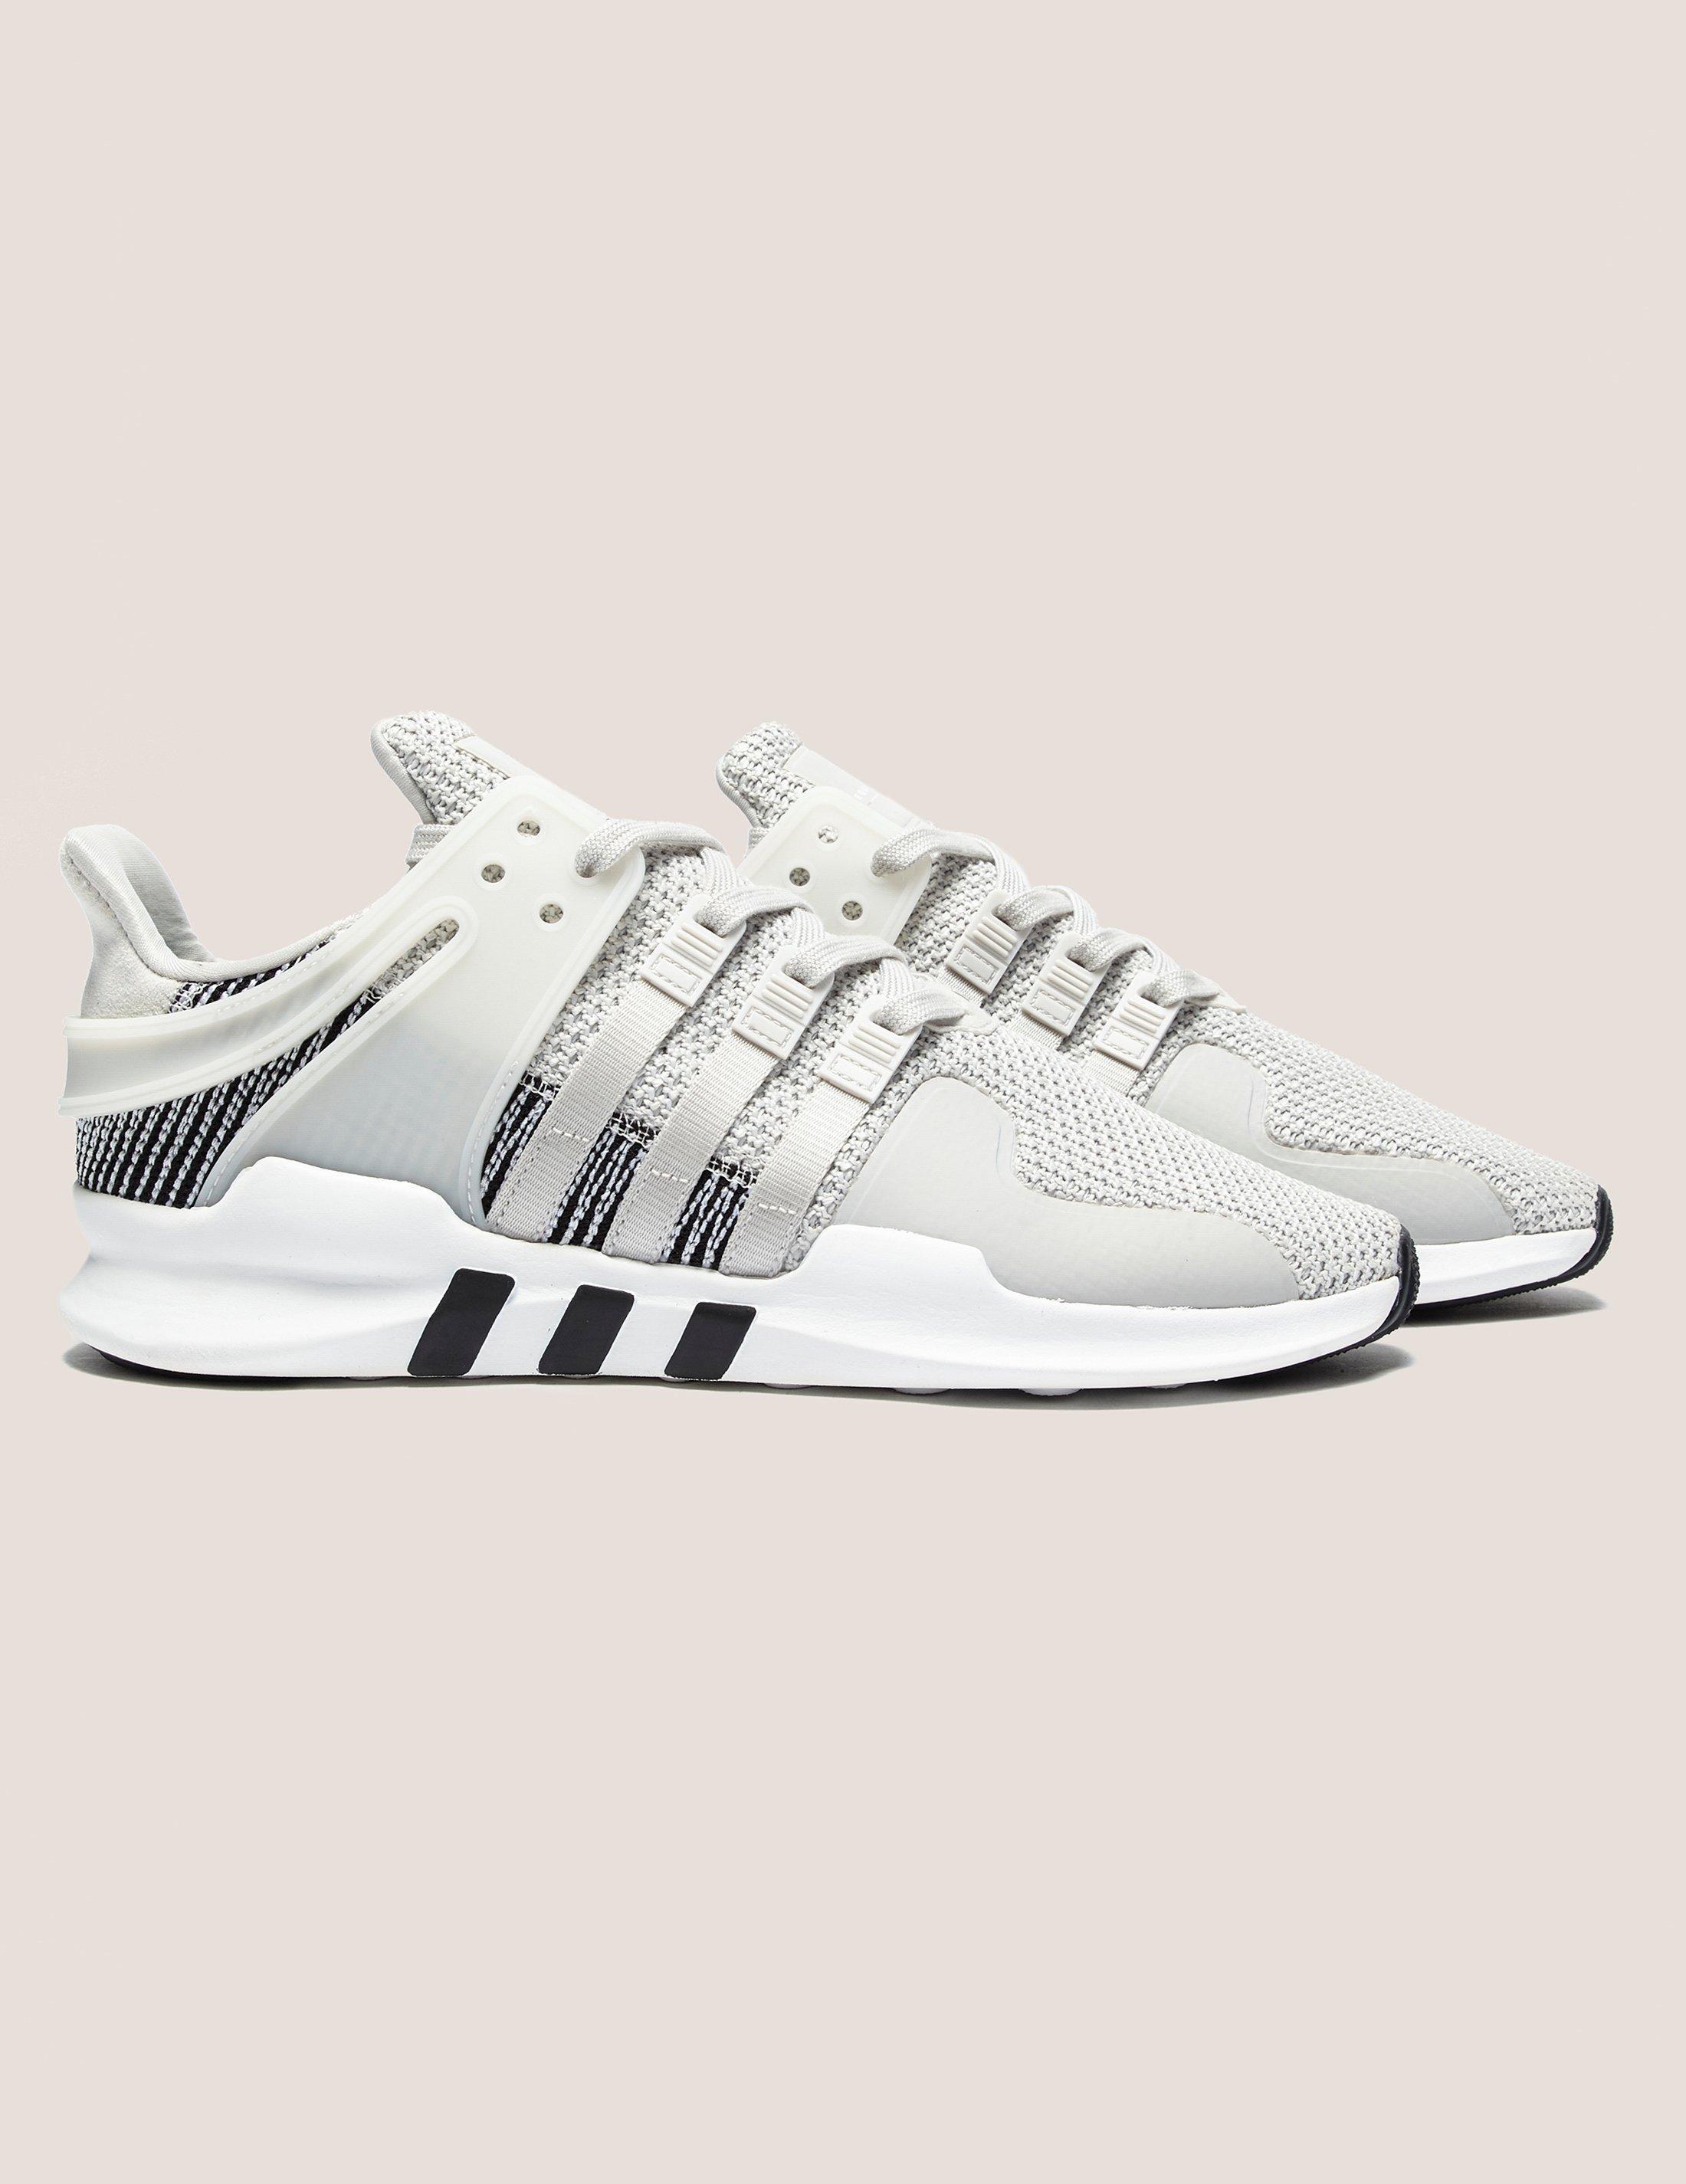 be2f7c87ac5c57 Adidas Originals Mens Eqt Support Adv White in White for Men - Lyst